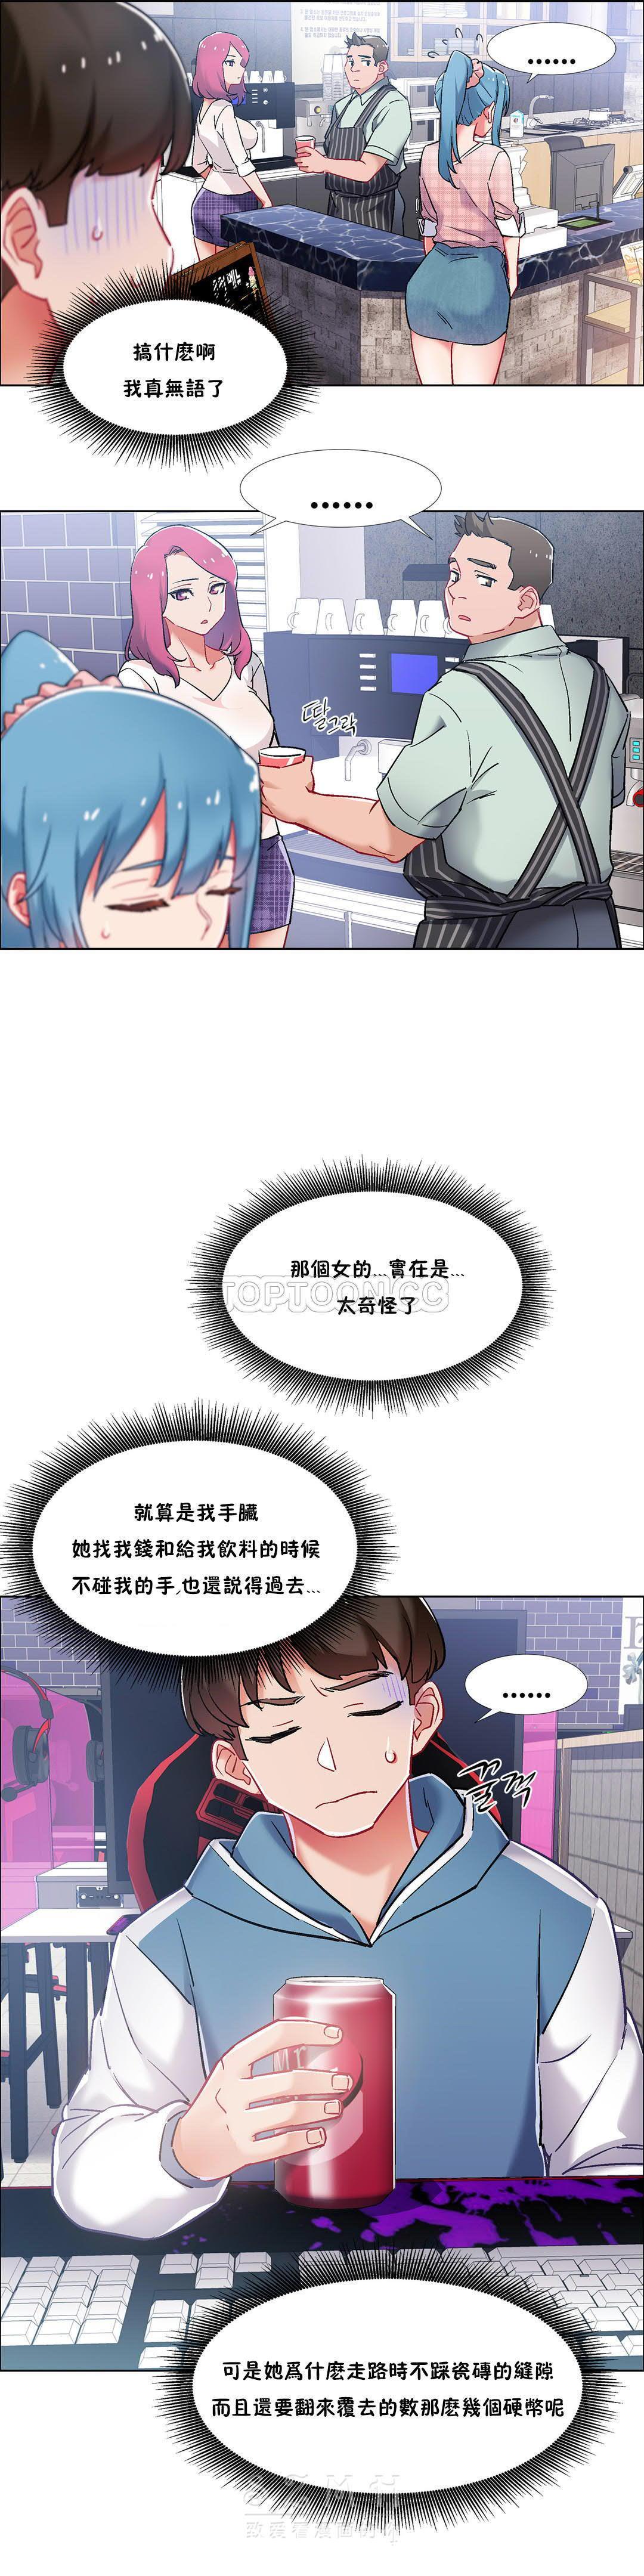 [Studio Wannabe] Rental Girls | 出租女郎 Ch. 33-58 [Chinese]  第二季 完结 42